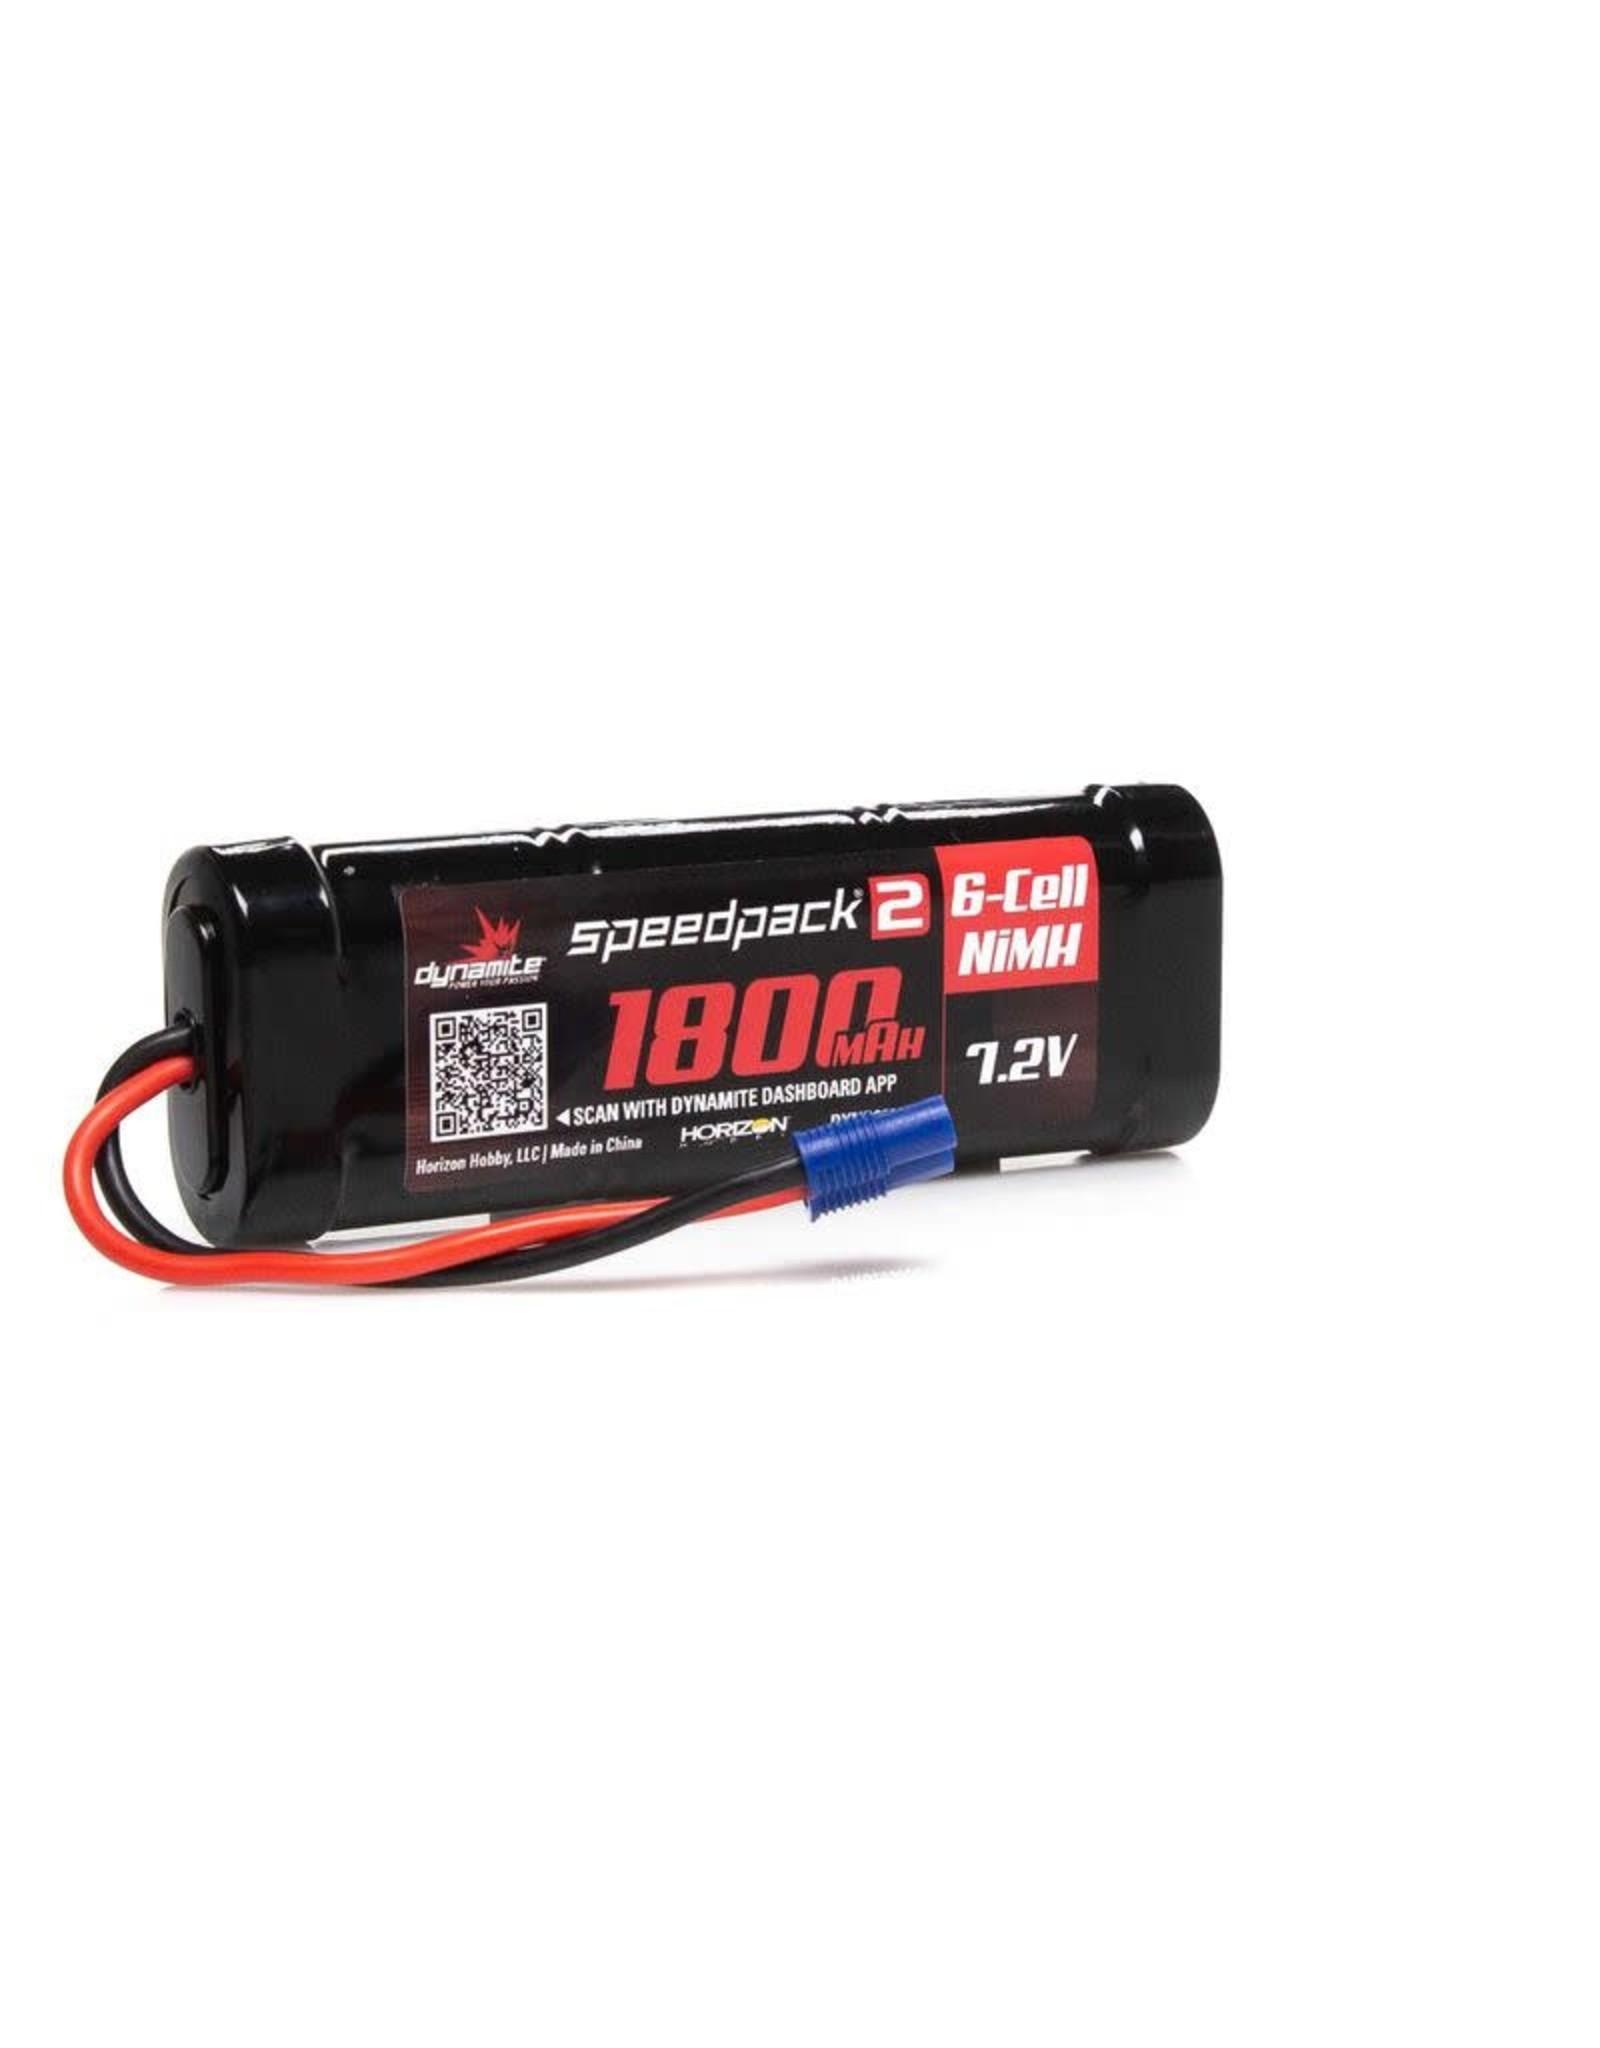 Dynamite 7.2V 1800mAh 6-Cell Speedpack2 Flat NiMH Battery: EC3